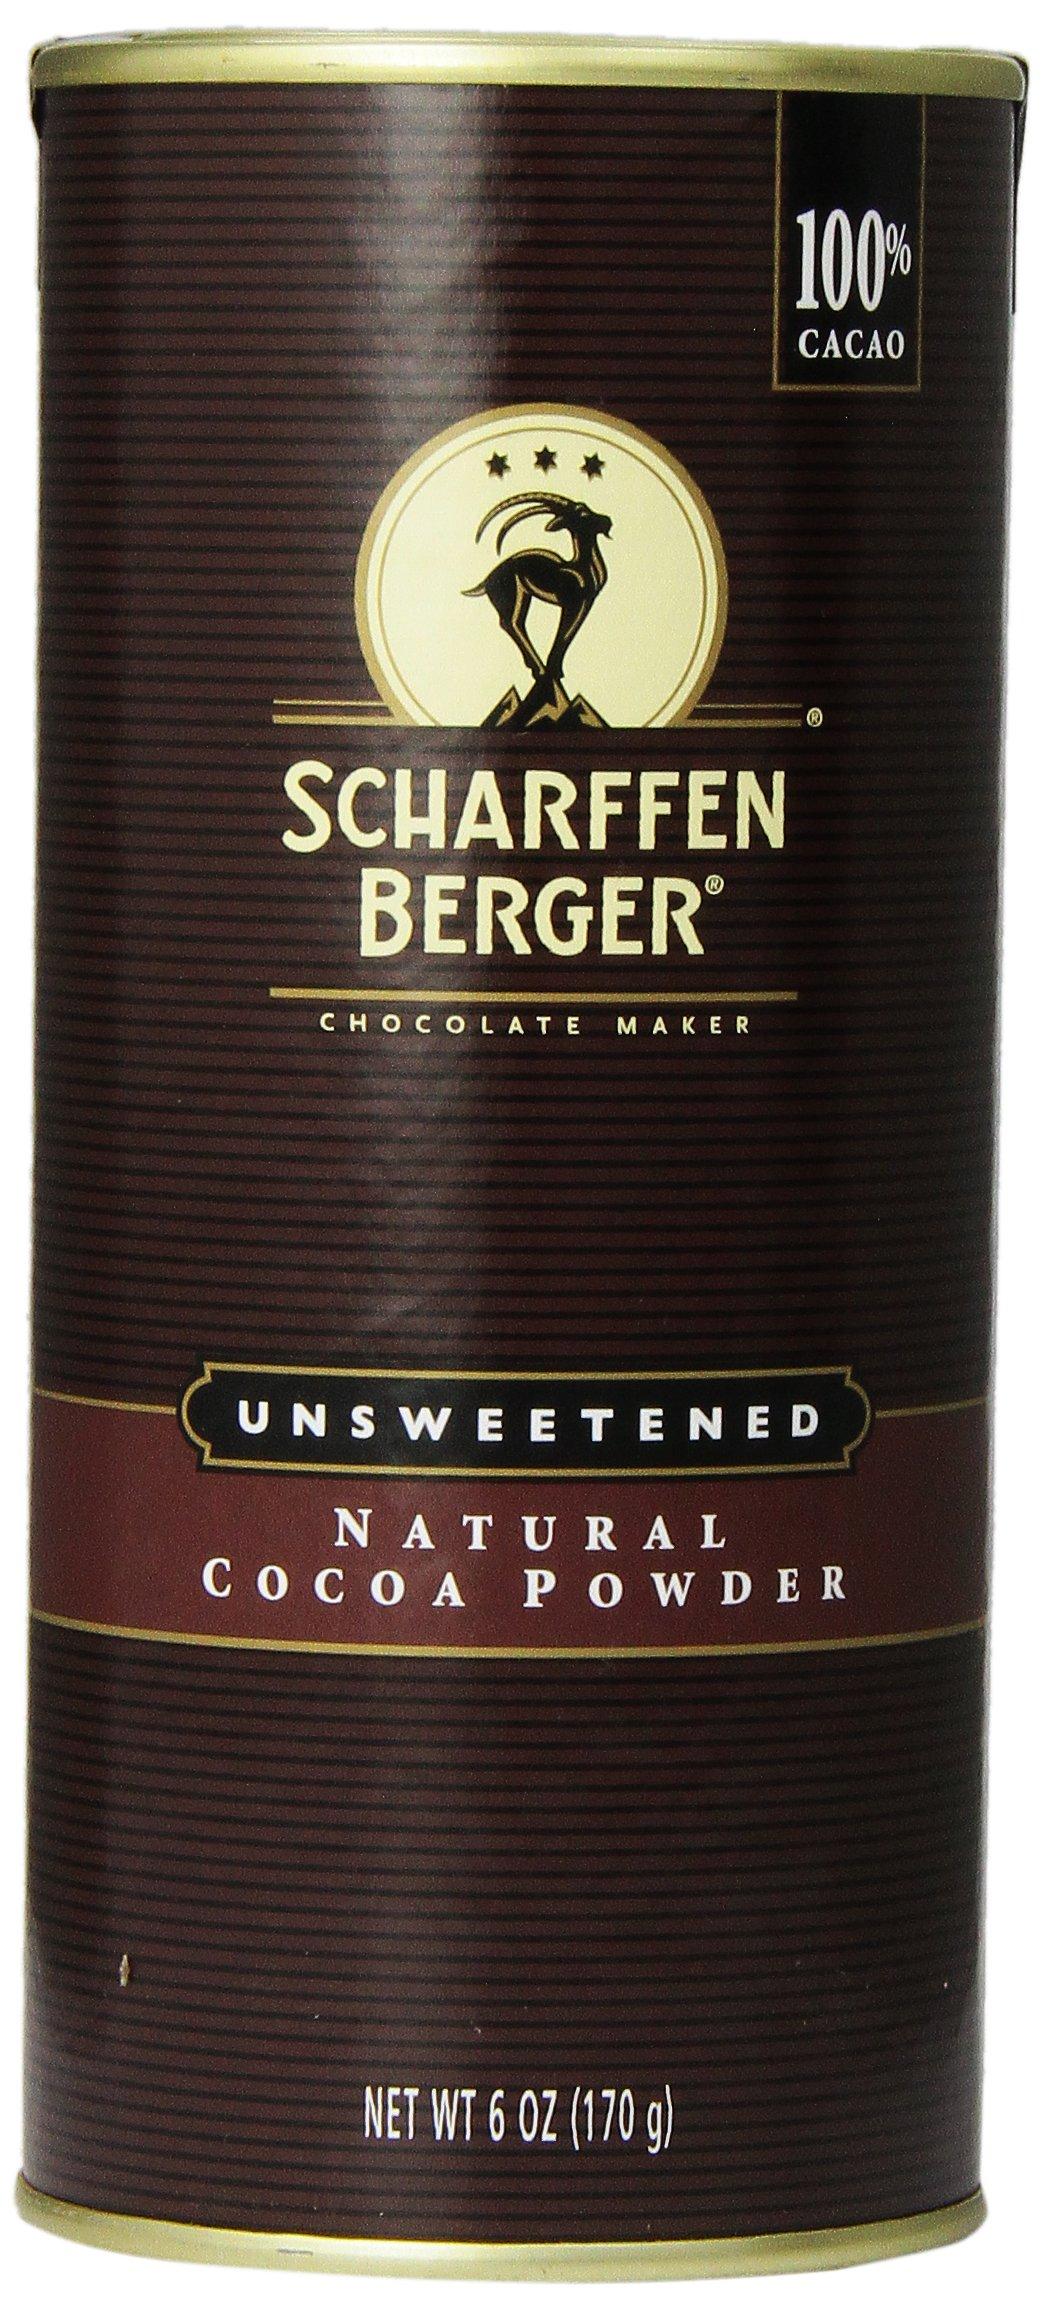 SCHARFFEN BERGER Cocoa Powder, 6oz, Naturally Unsweetened